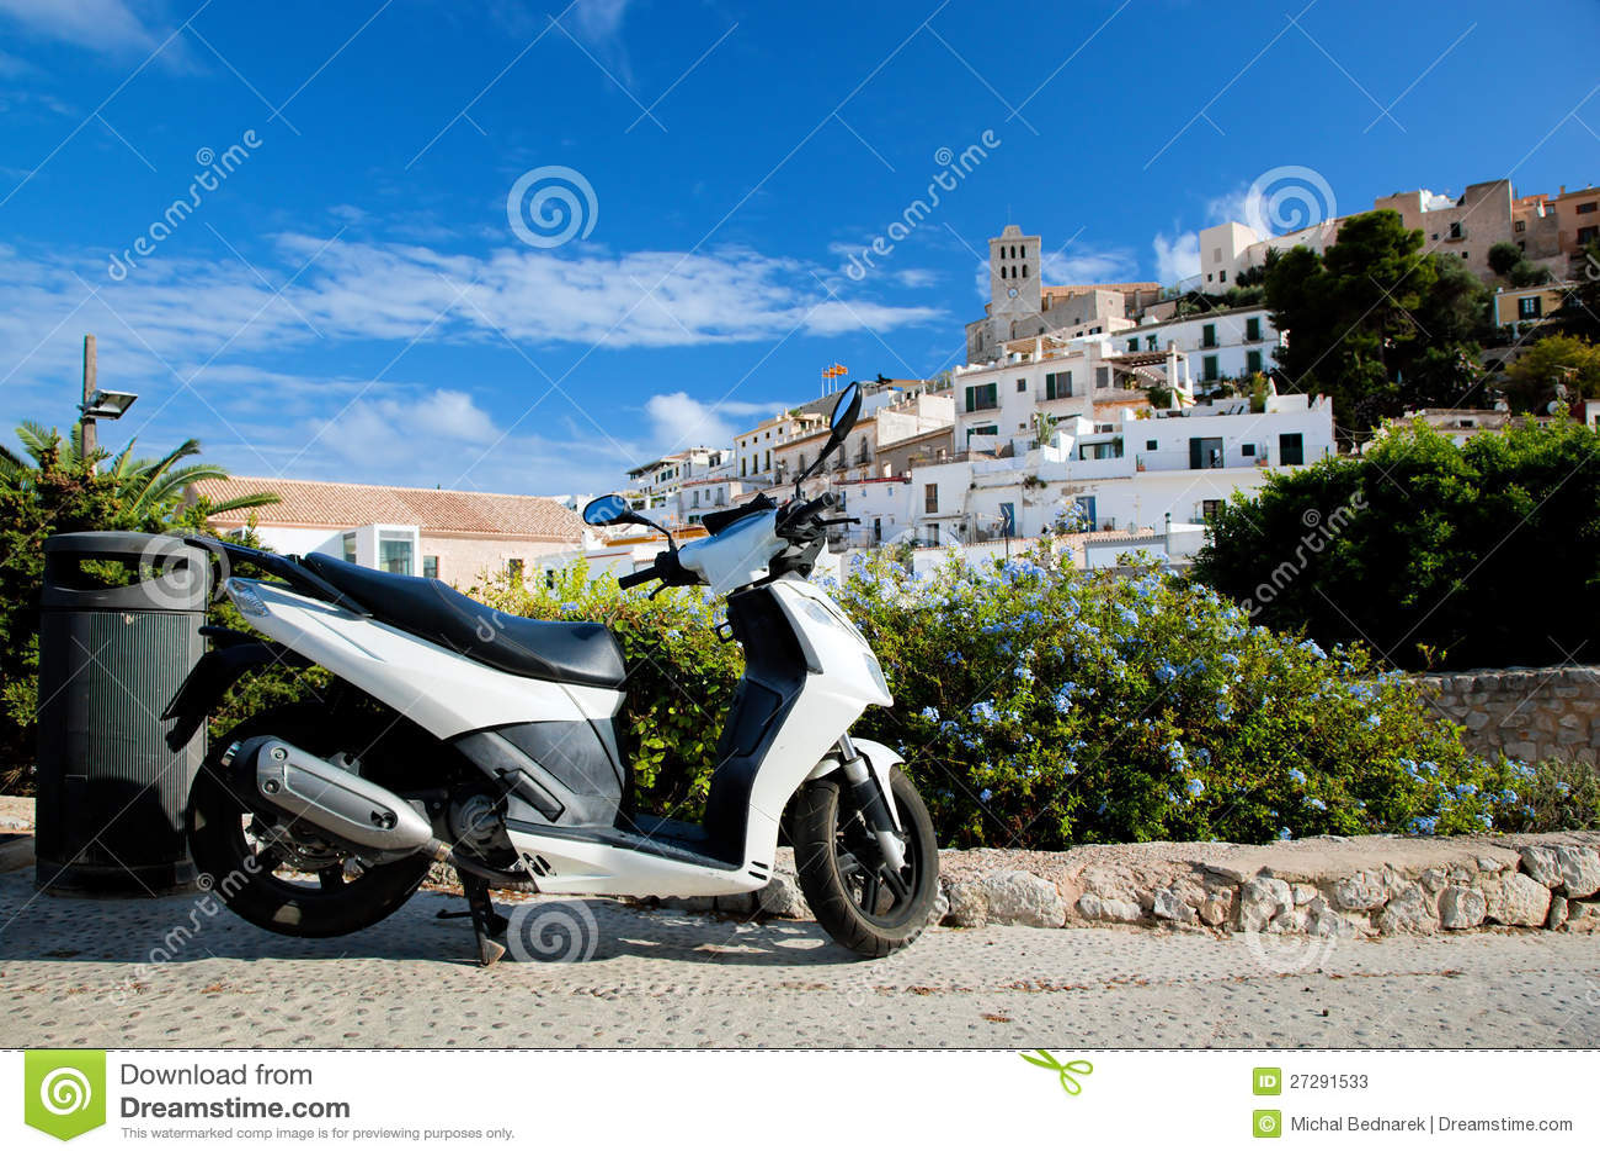 Hulajnoga i panorama Ibiza, Hiszpania